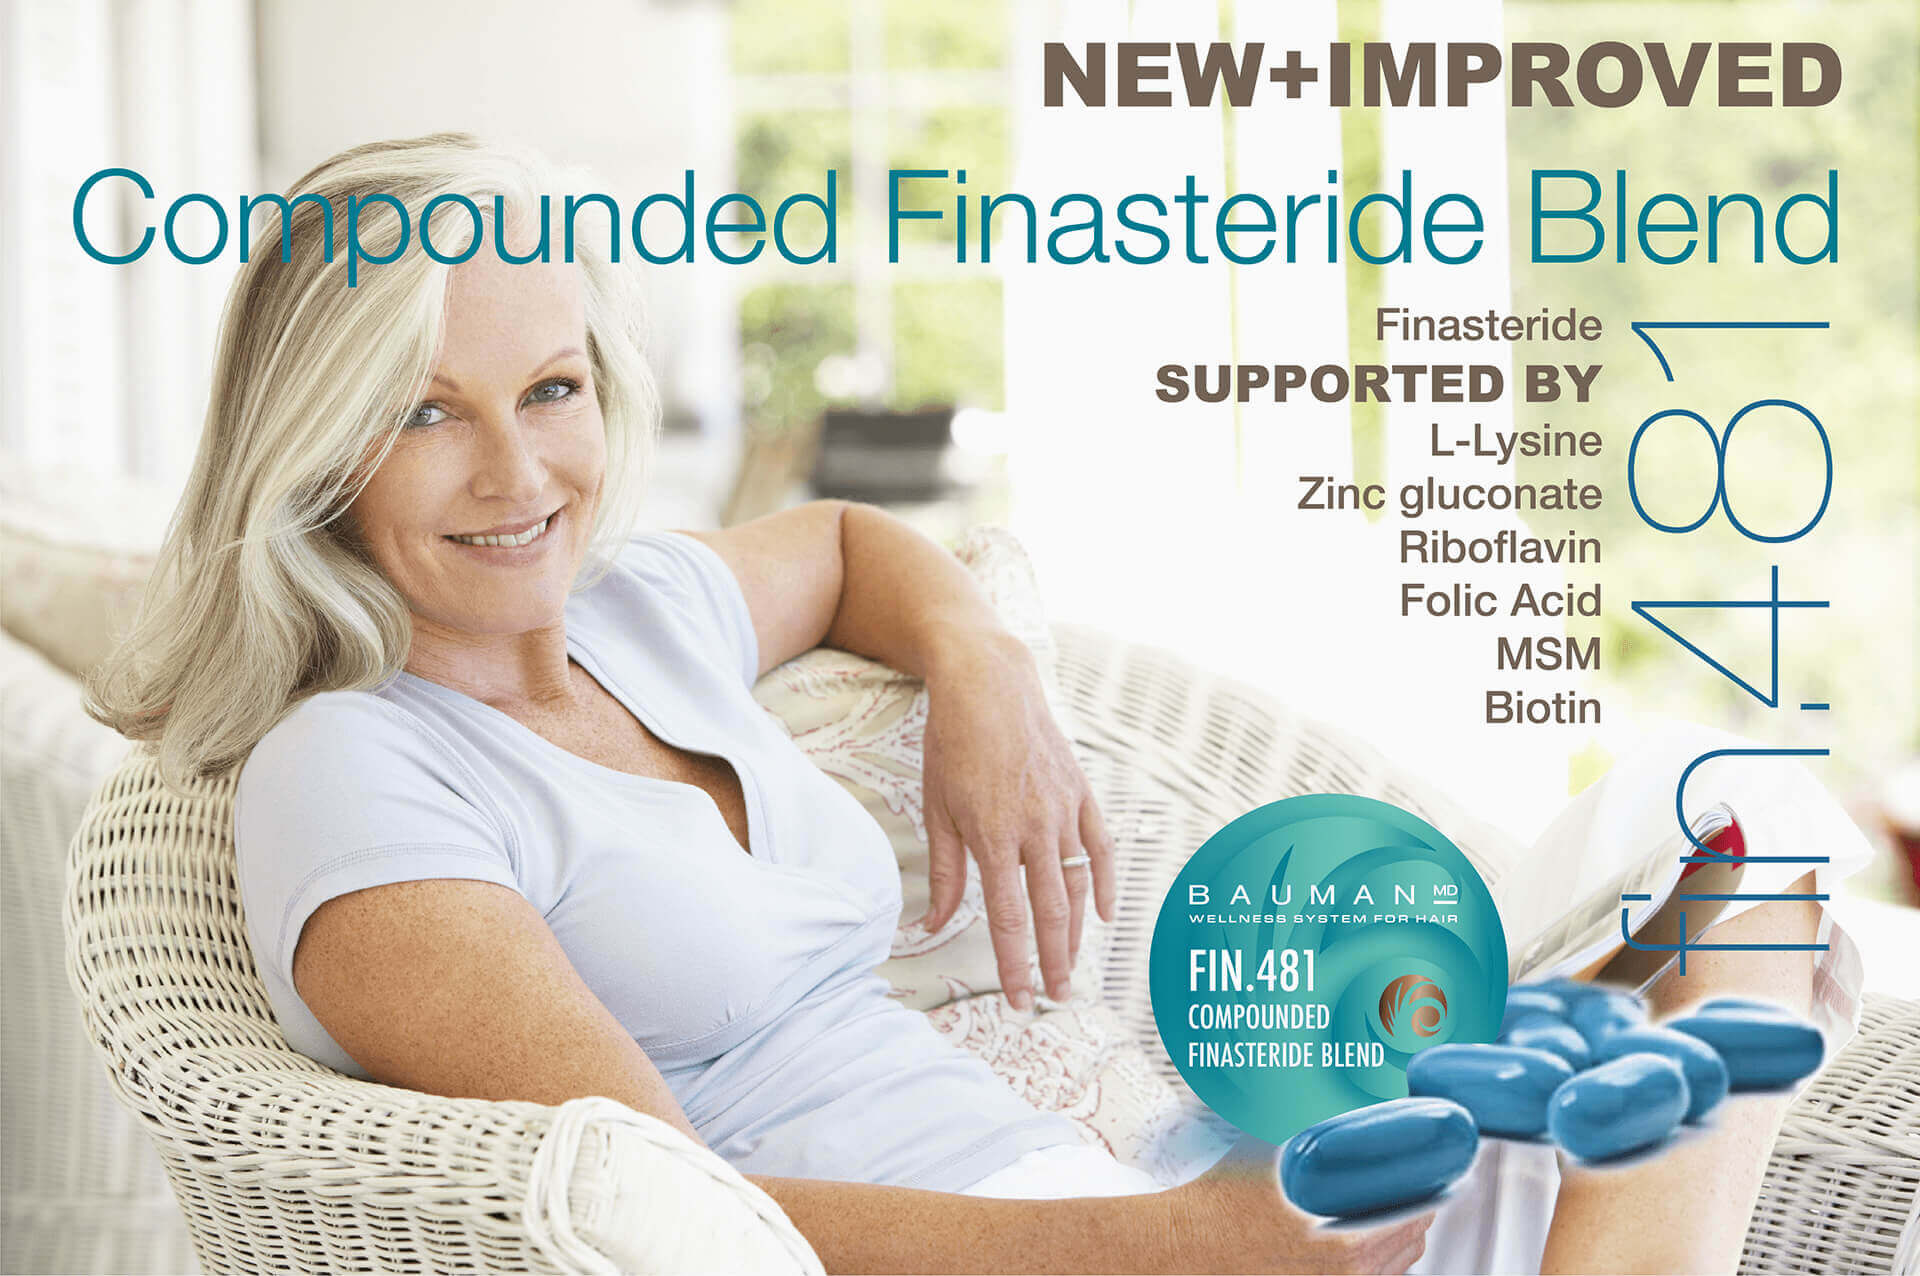 Compounded Finasteride Fin 481 Bauman Medical